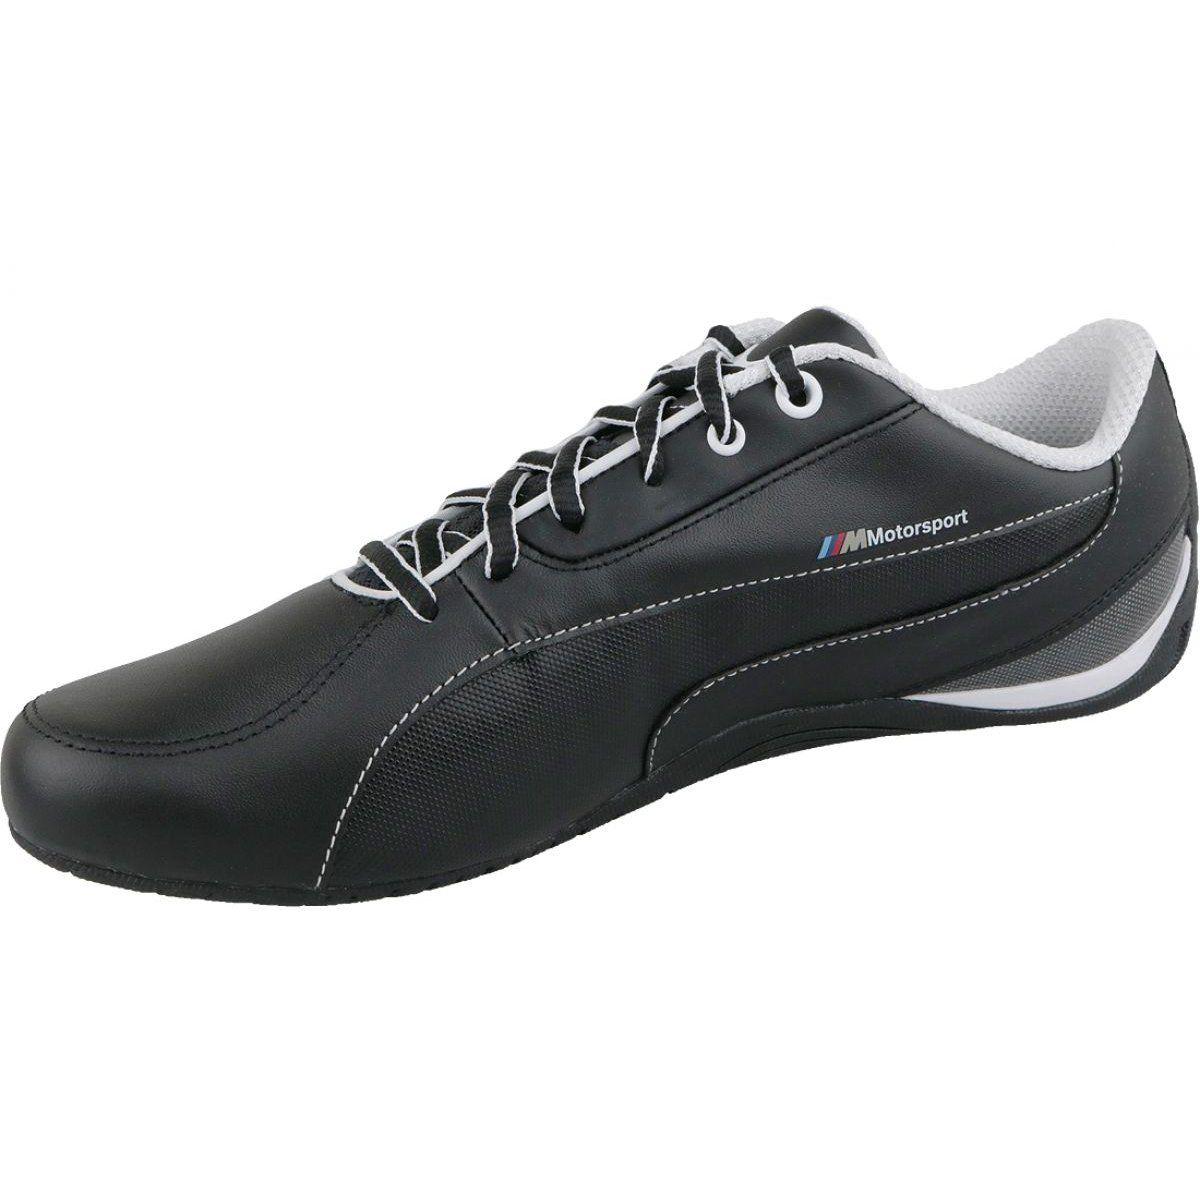 Puma Drift Cat 5 Bmw Nm M 304879 03 Shoes Navy Casual Shoes Shoes Bmw